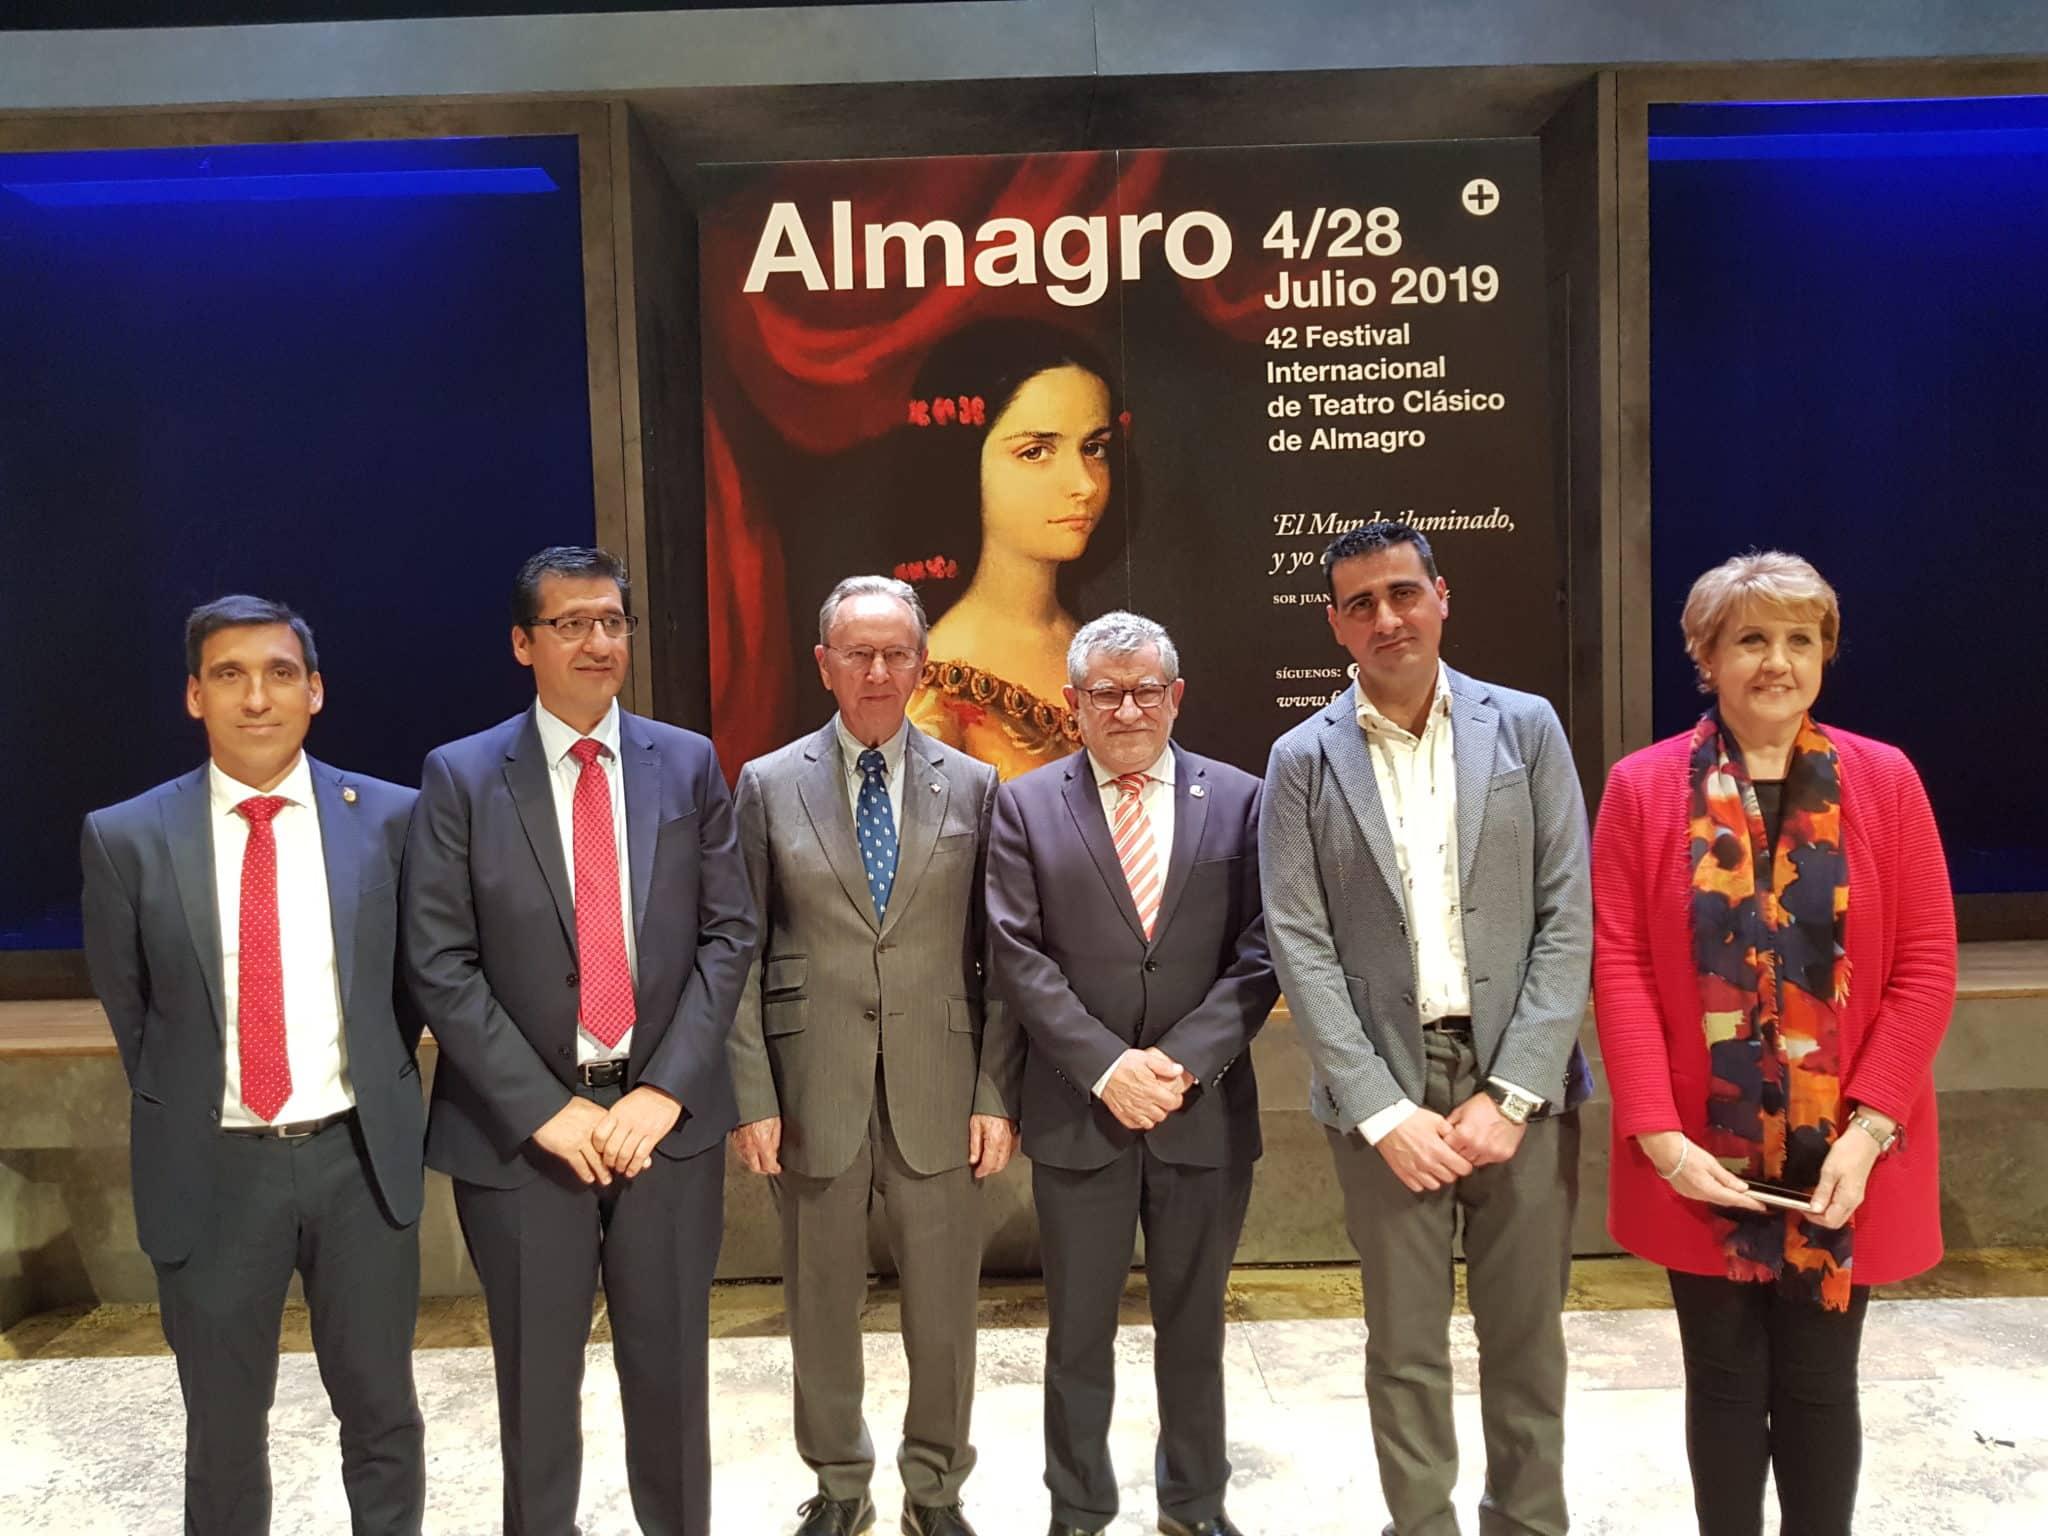 https://blog.globalcaja.es/wp-content/uploads/2019/04/Festival-Almagro.jpeg